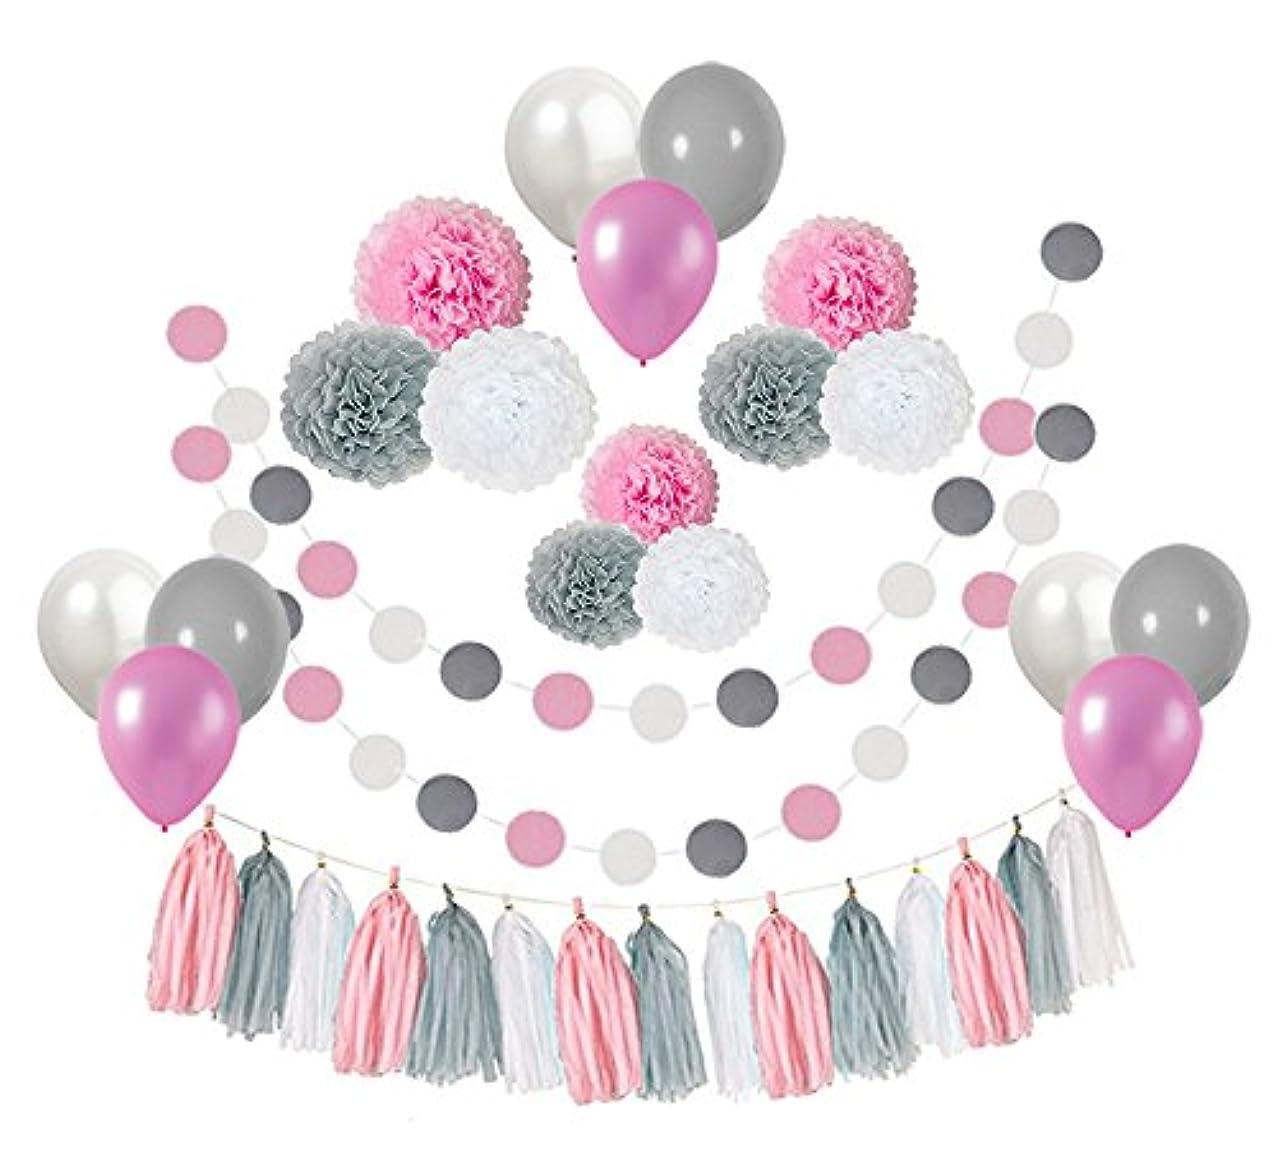 Topfun 35 pcs Baby Girl Shower Decorations Pink Gray White Paper Pom Poms Flowers Tissue Tassel Polka Dot Paper Garland kit with 12